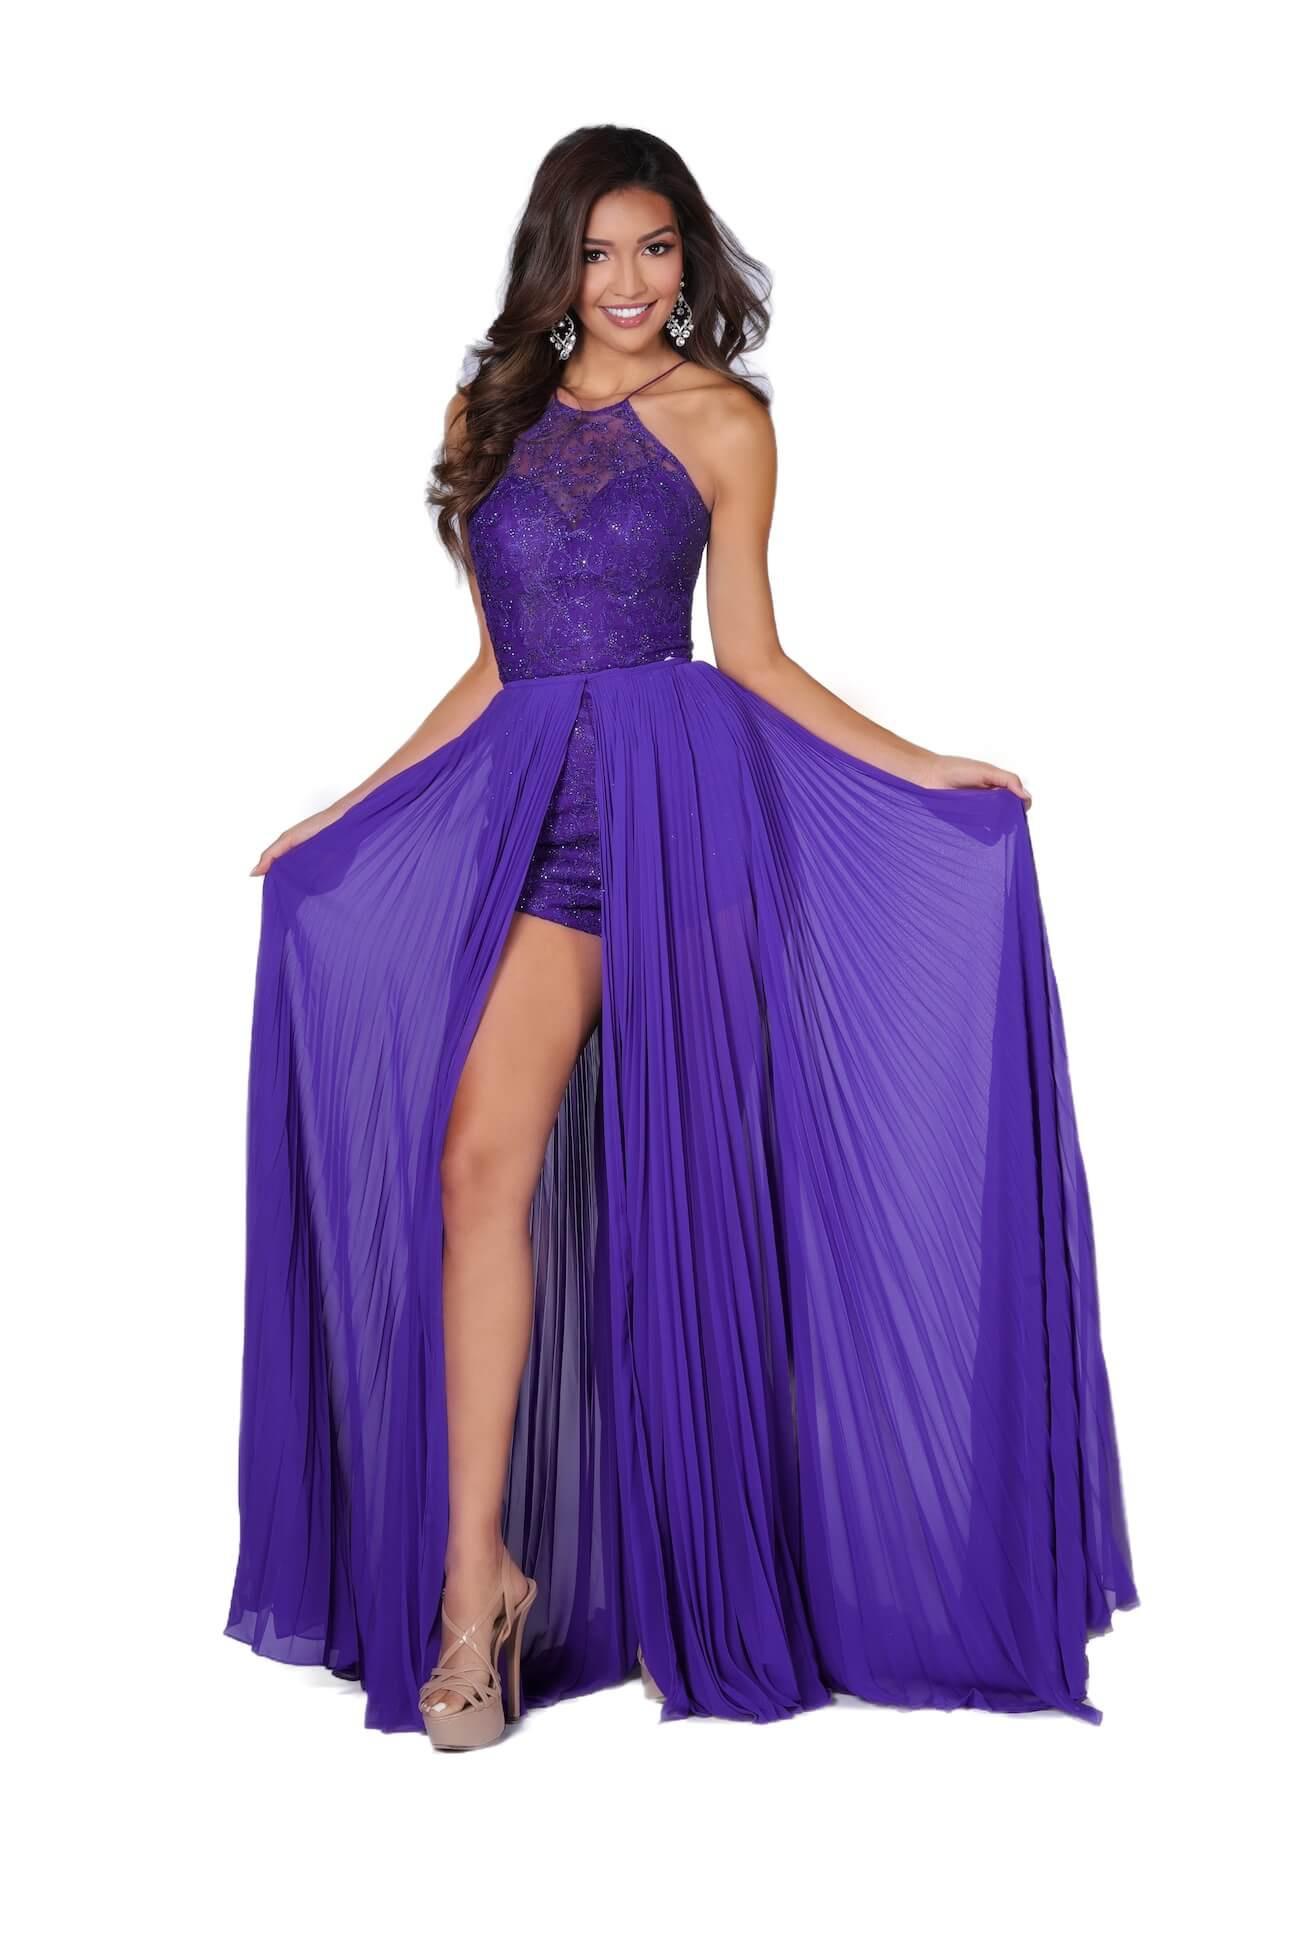 Vienna Purple Size 10 Overskirt Romper/Jumpsuit Dress on Queenly